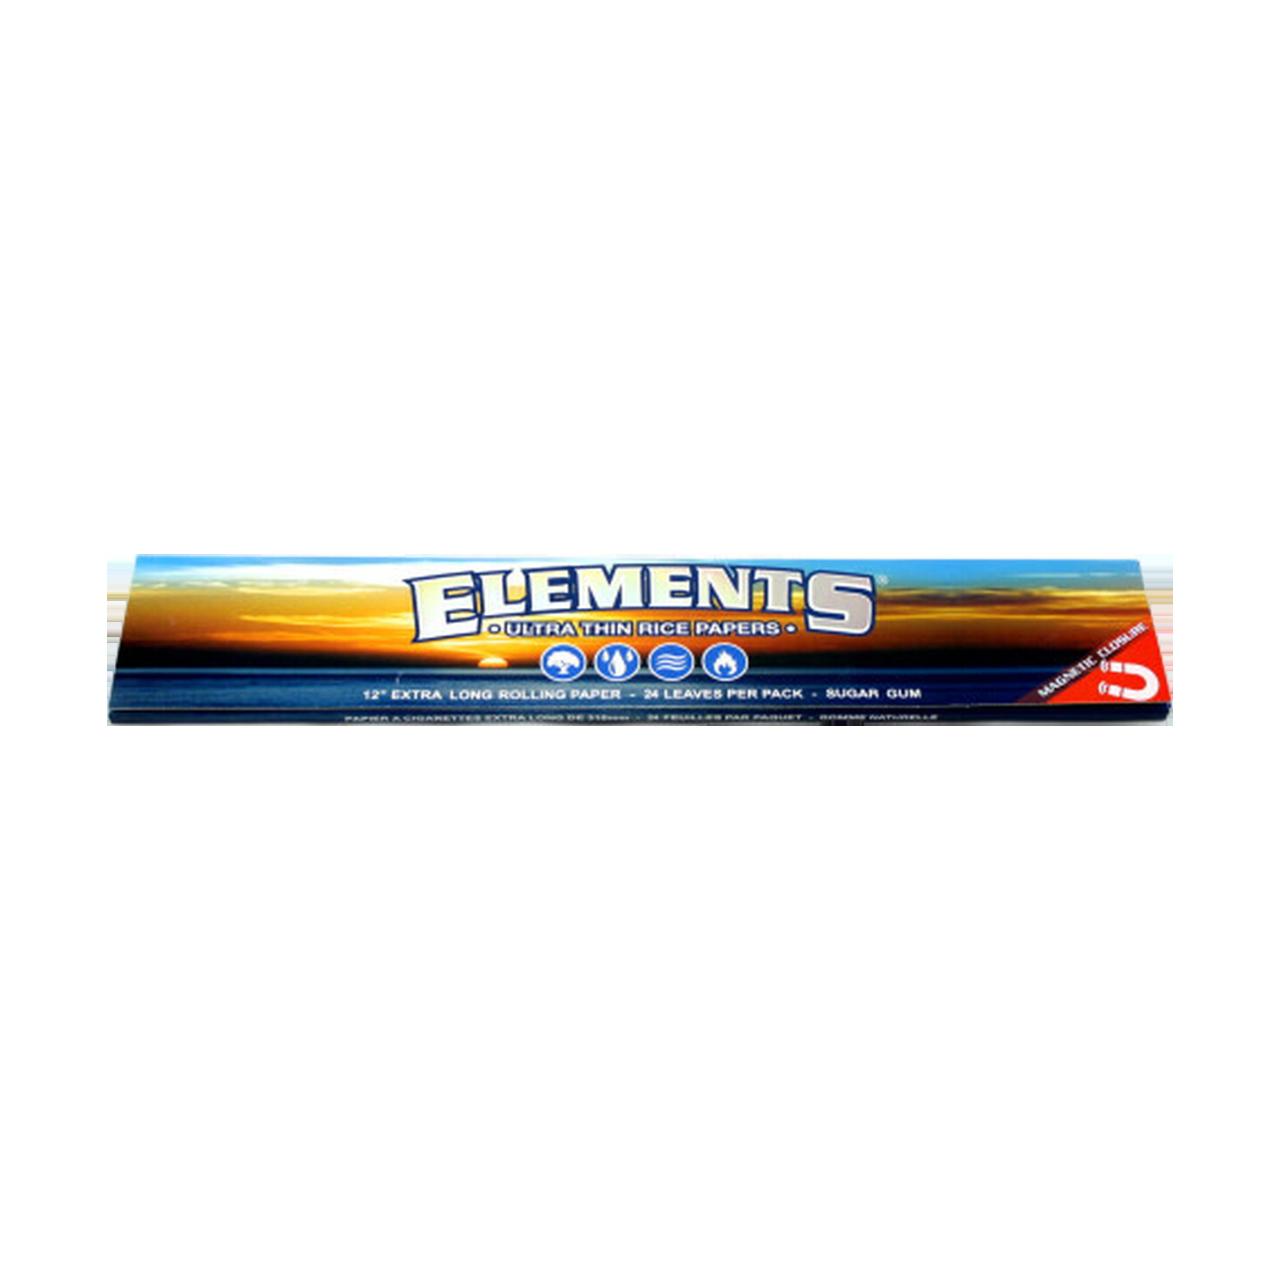 Elements 12